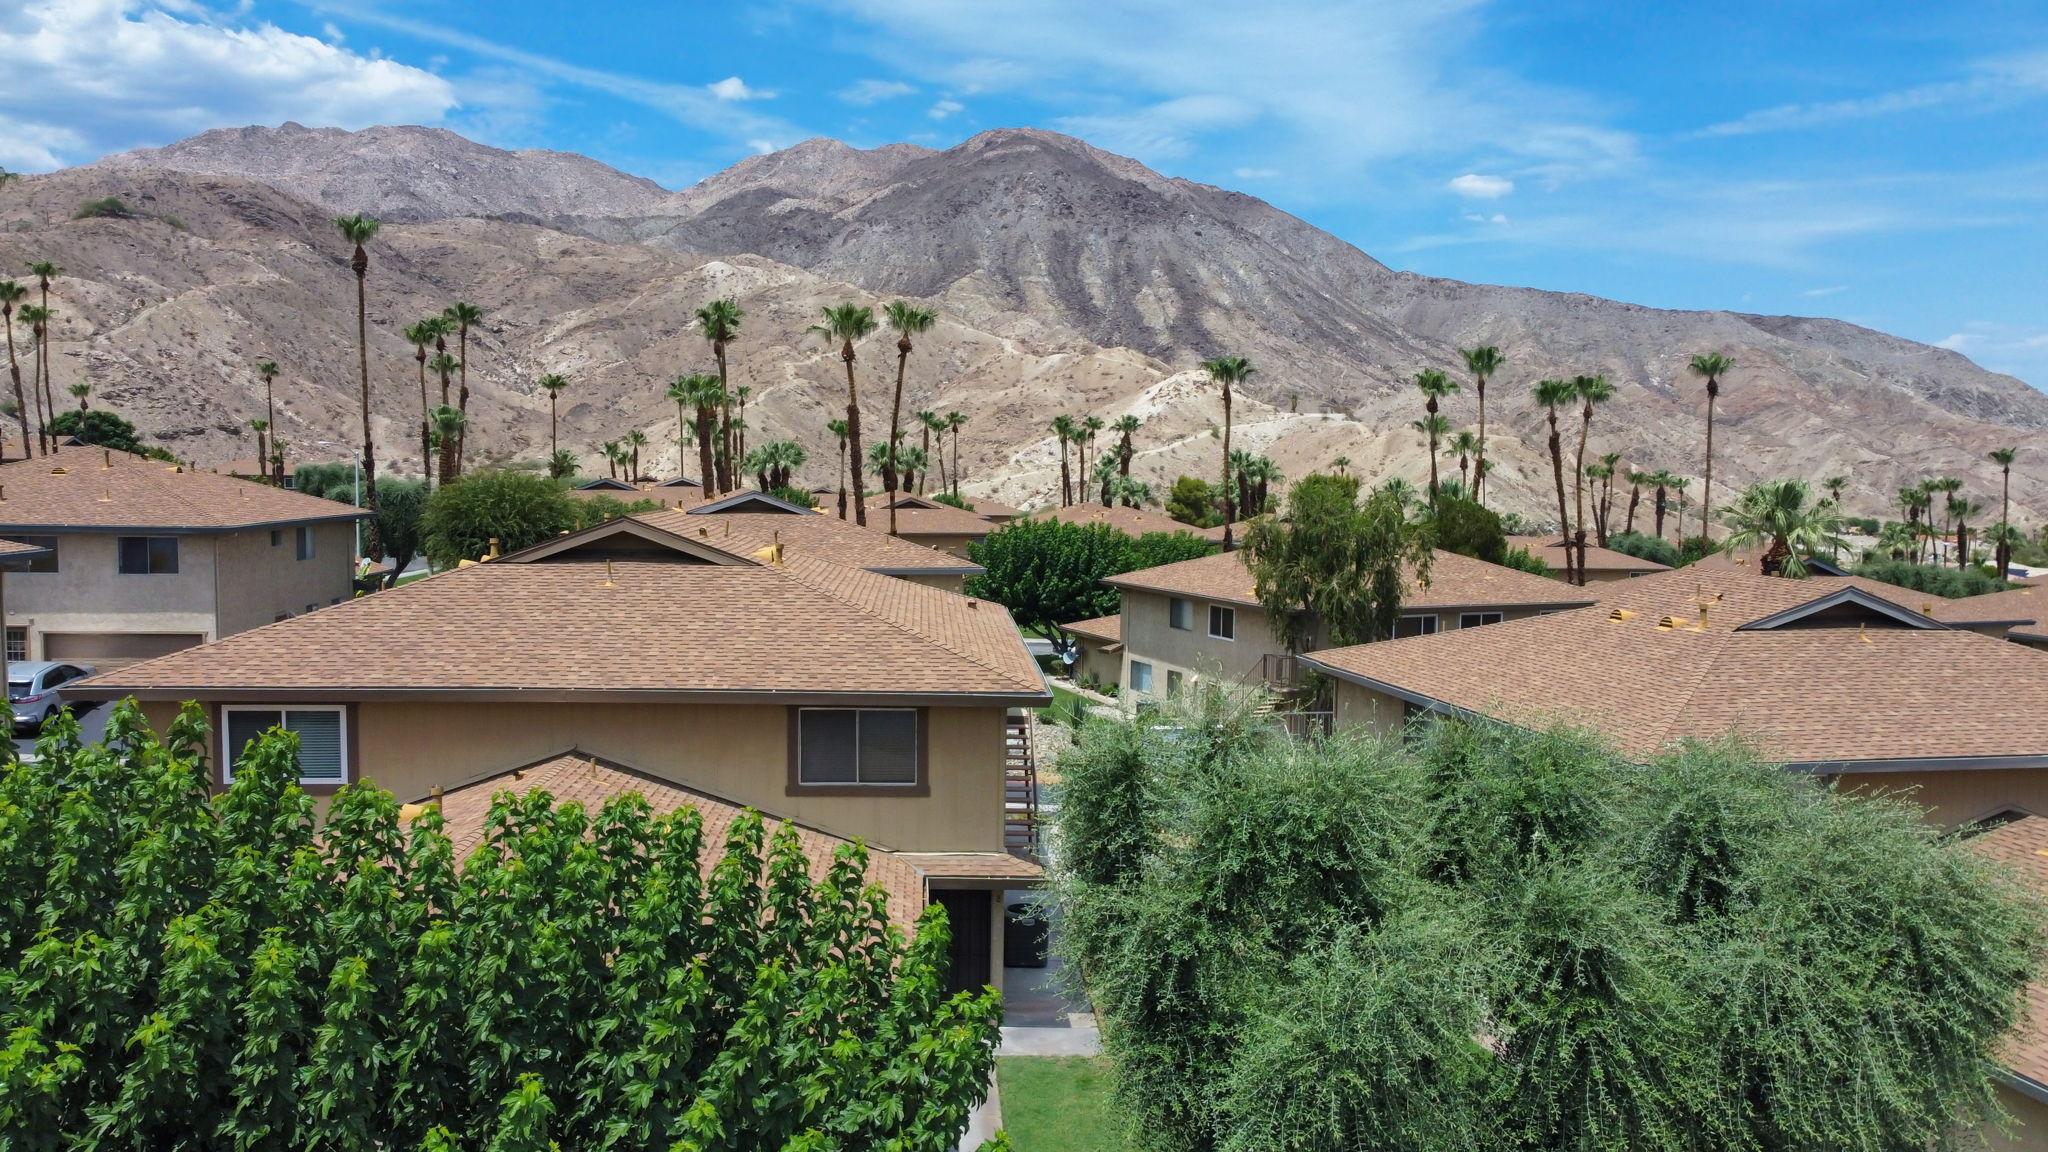 46869 CA-74, Palm Desert, CA 92260, USA Photo 2